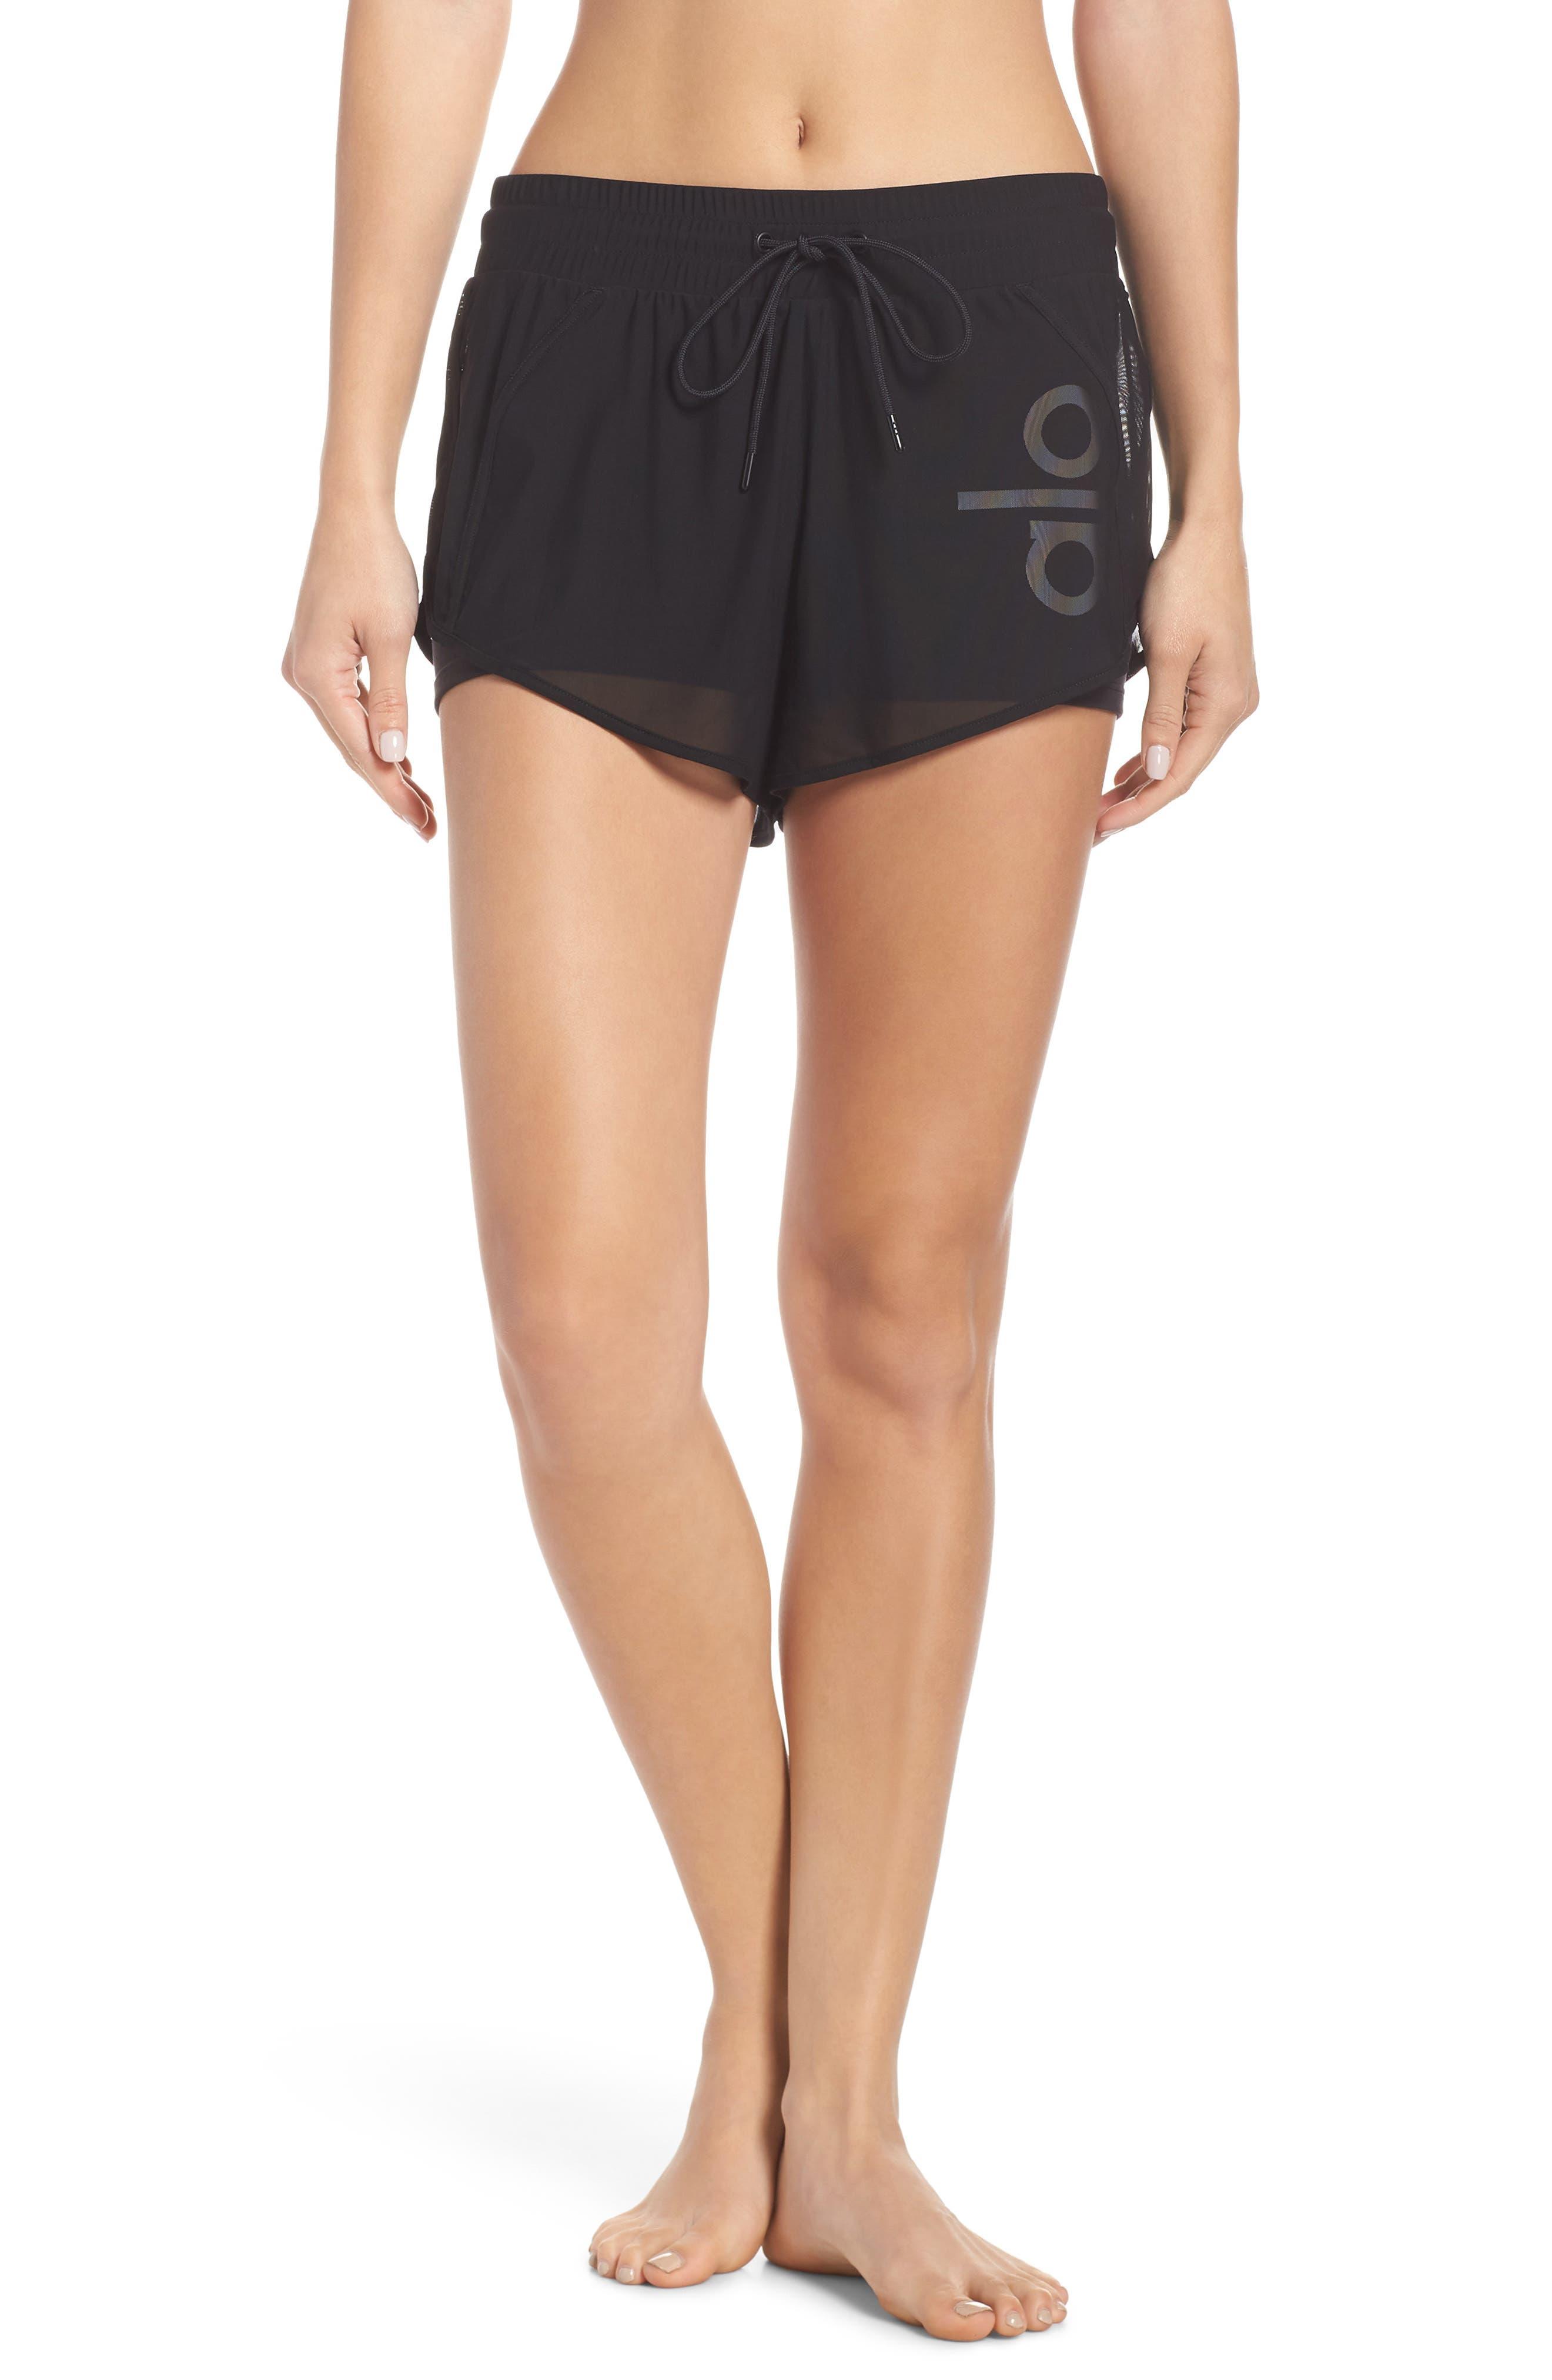 Ambience Shorts,                         Main,                         color, BLACK/ BLACK/ ALO/ WHITE